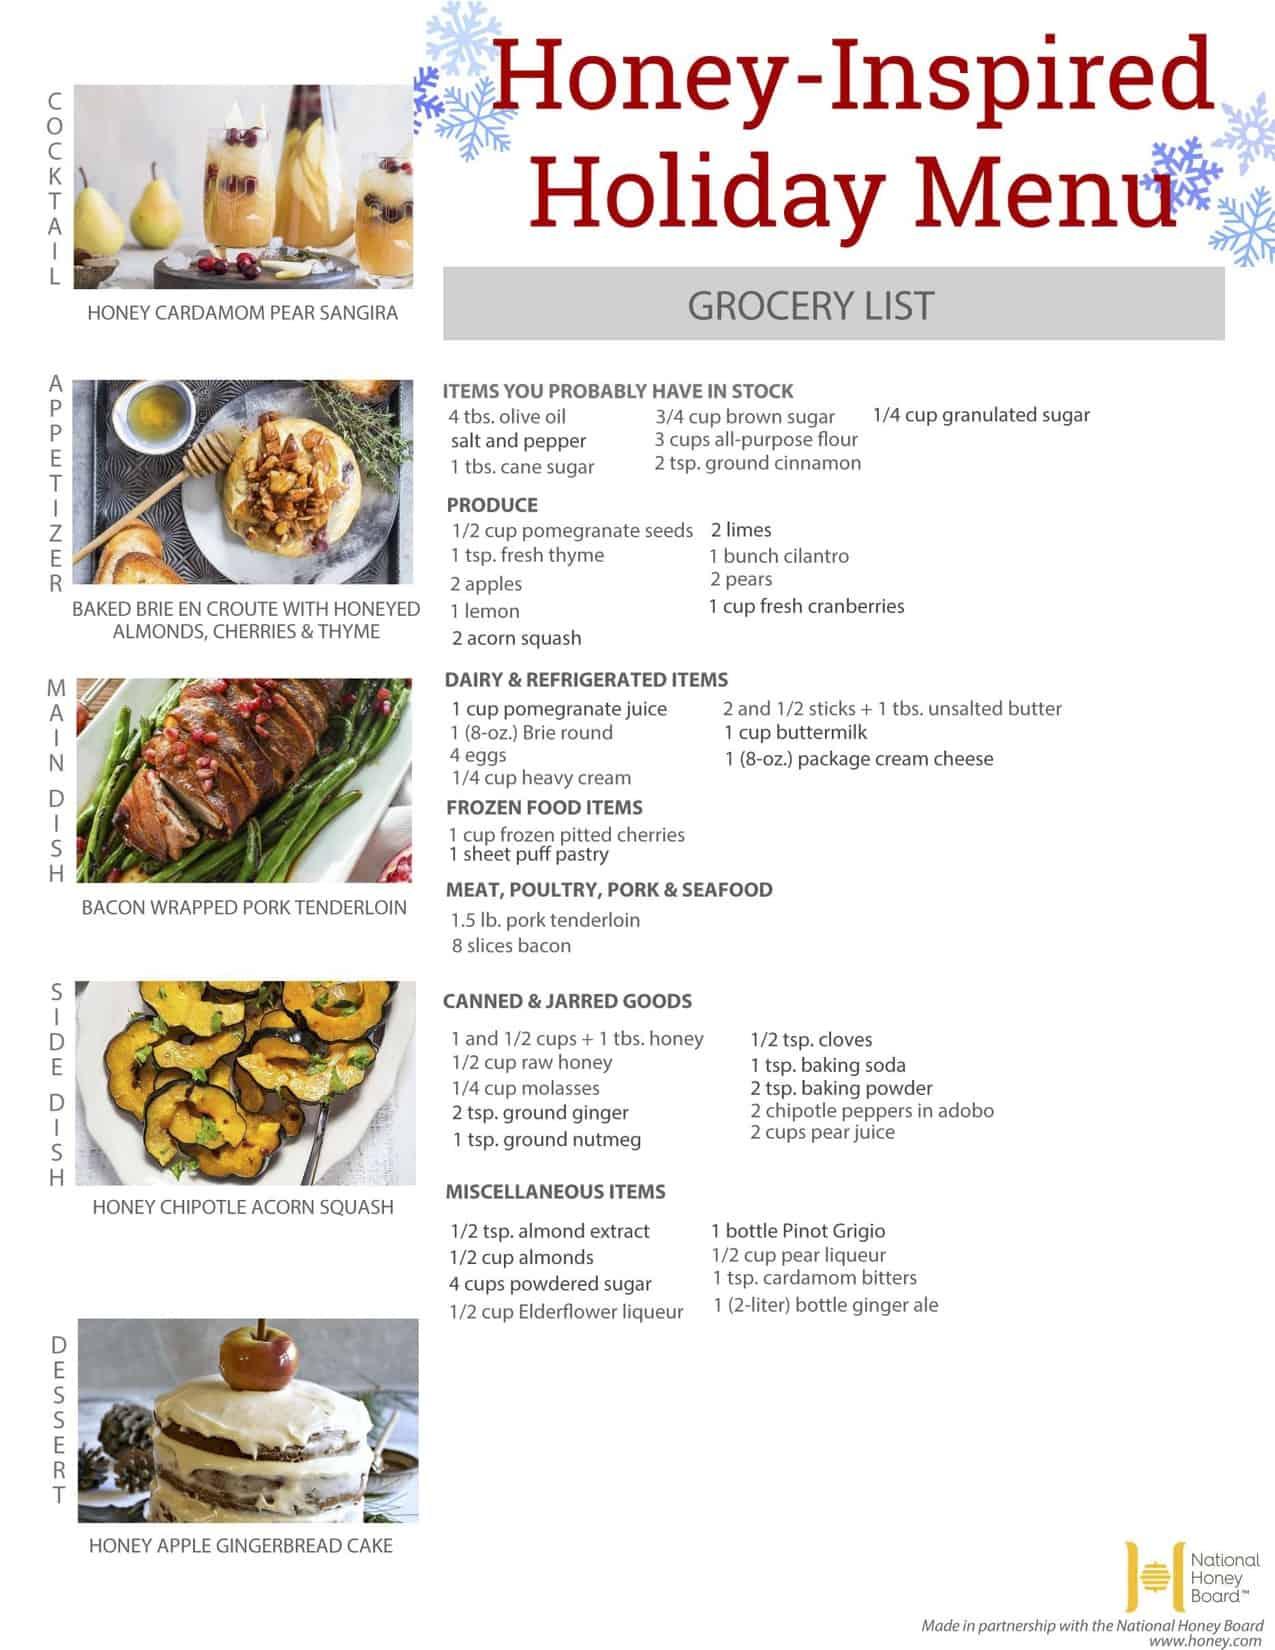 honey-inspired holiday menu